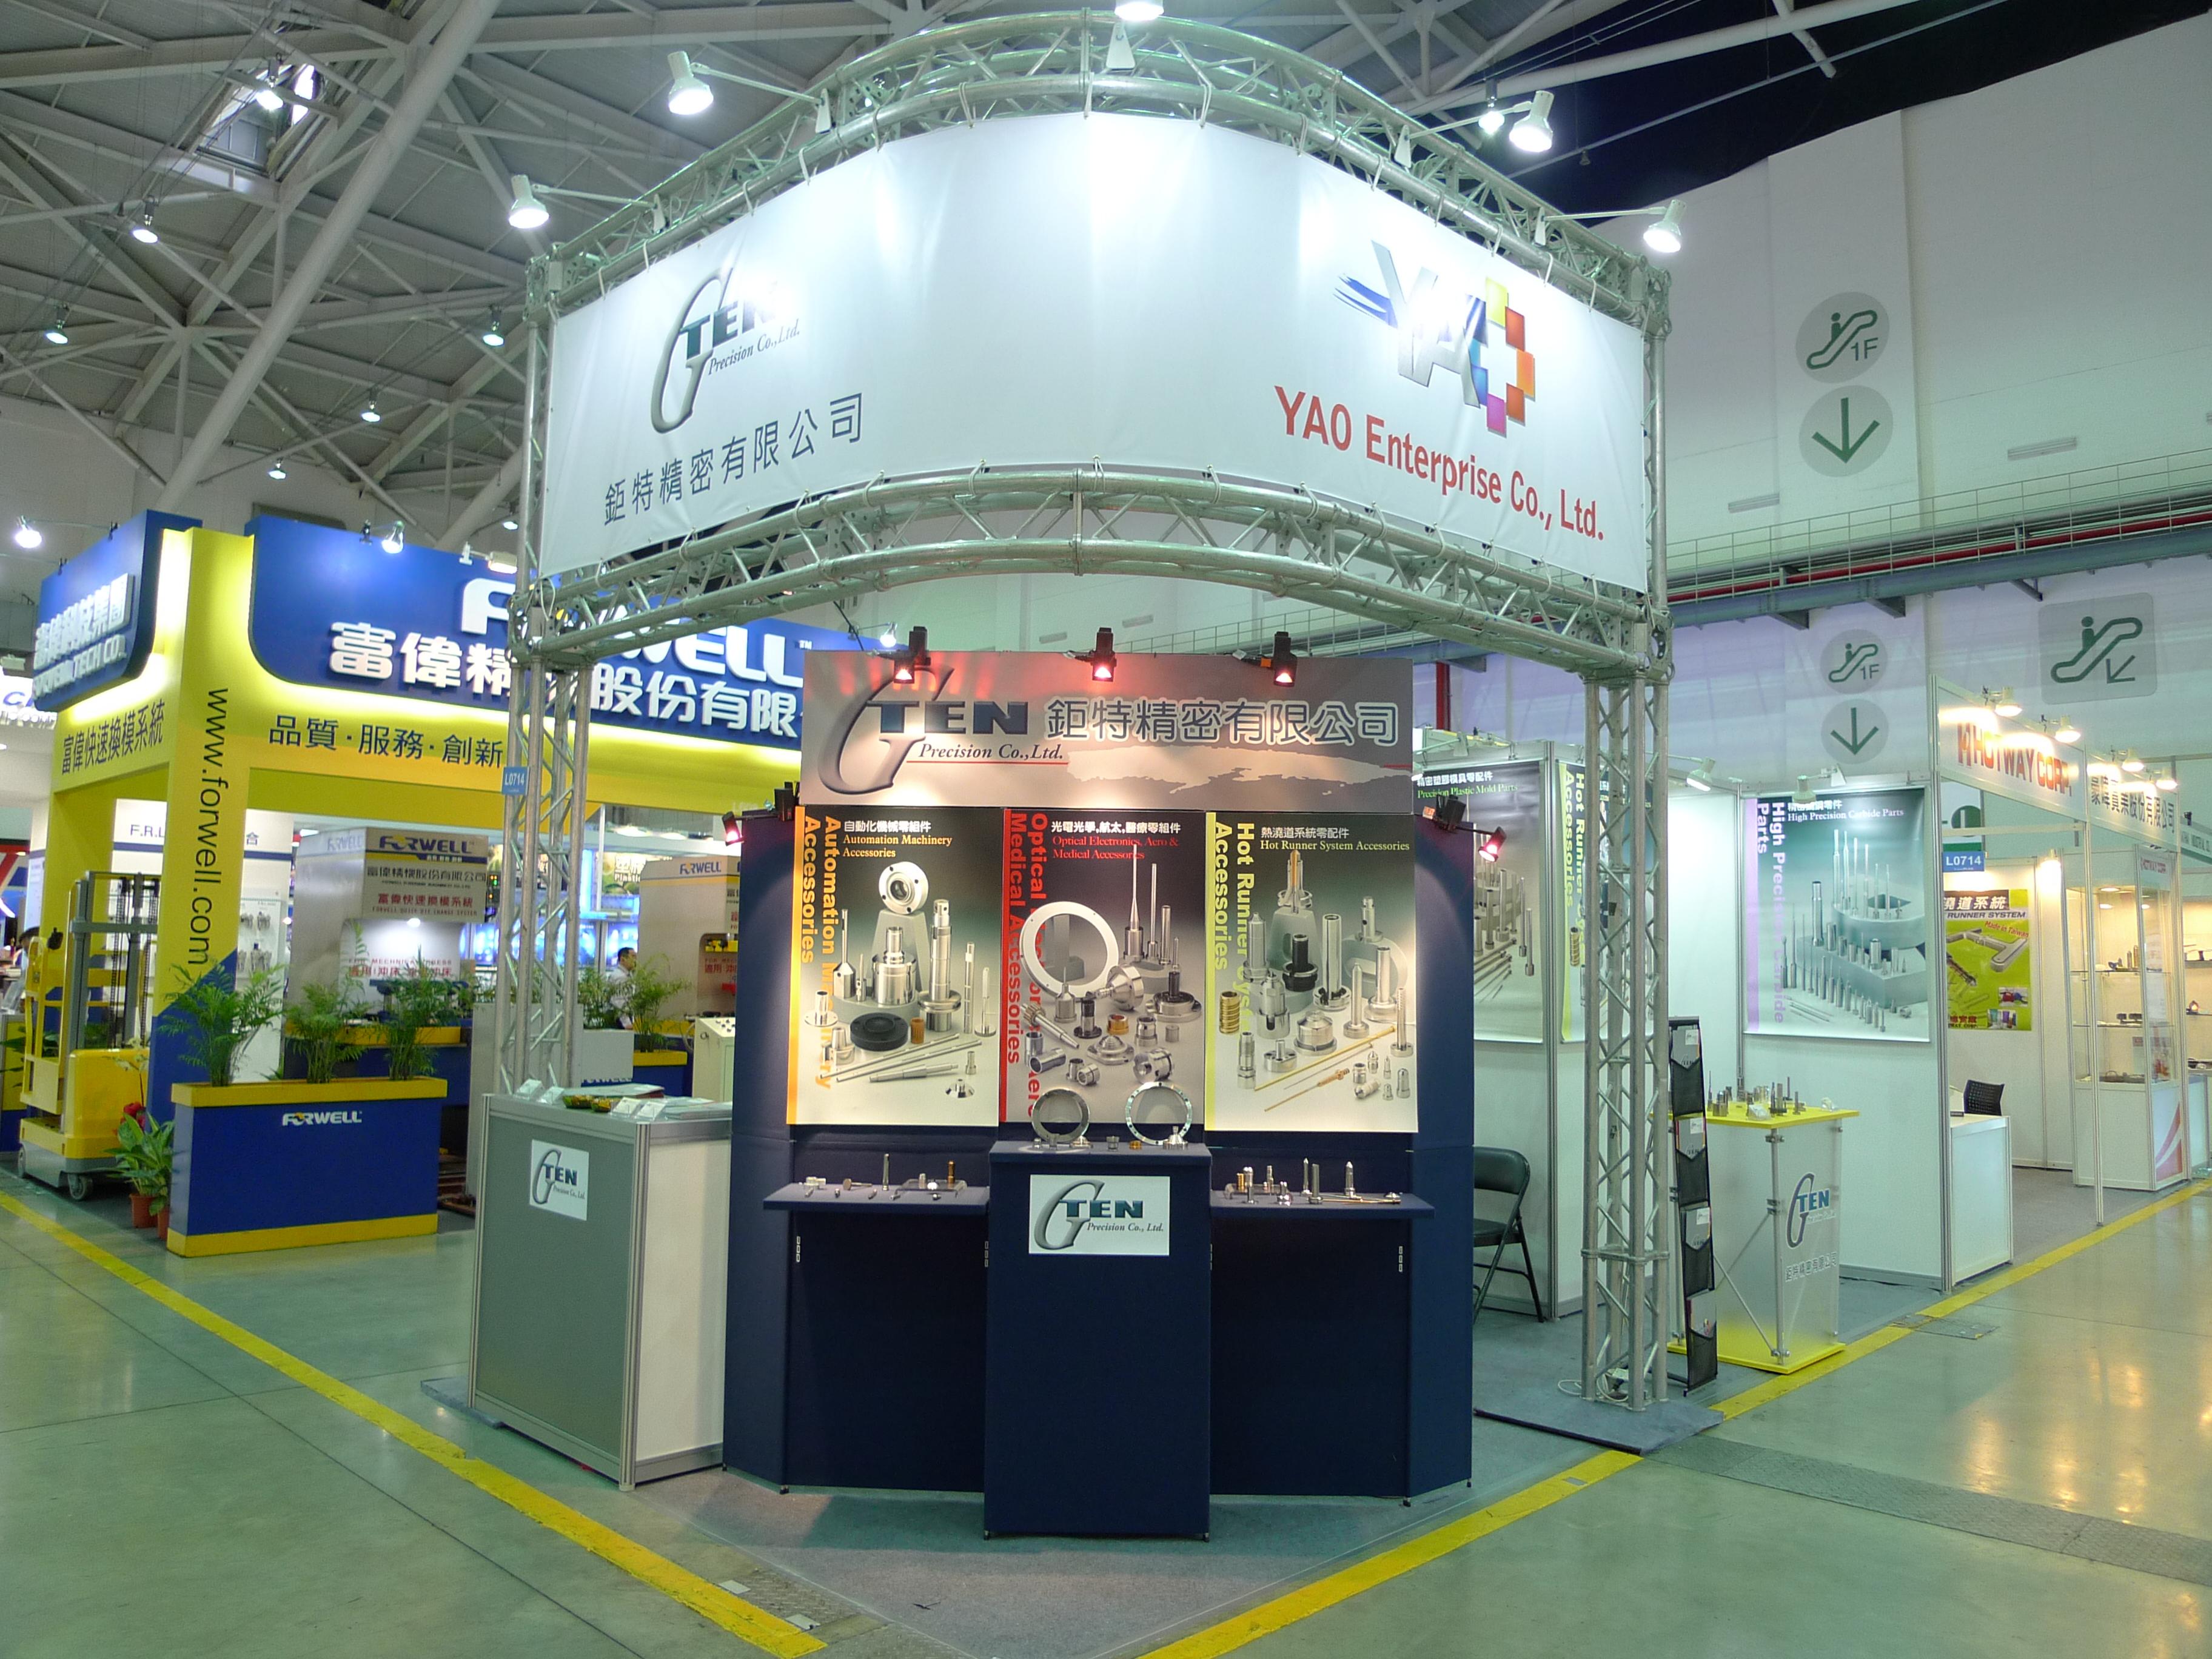 Exhibition Booth En Espanol : Taipei plas yao news and events enterprise co